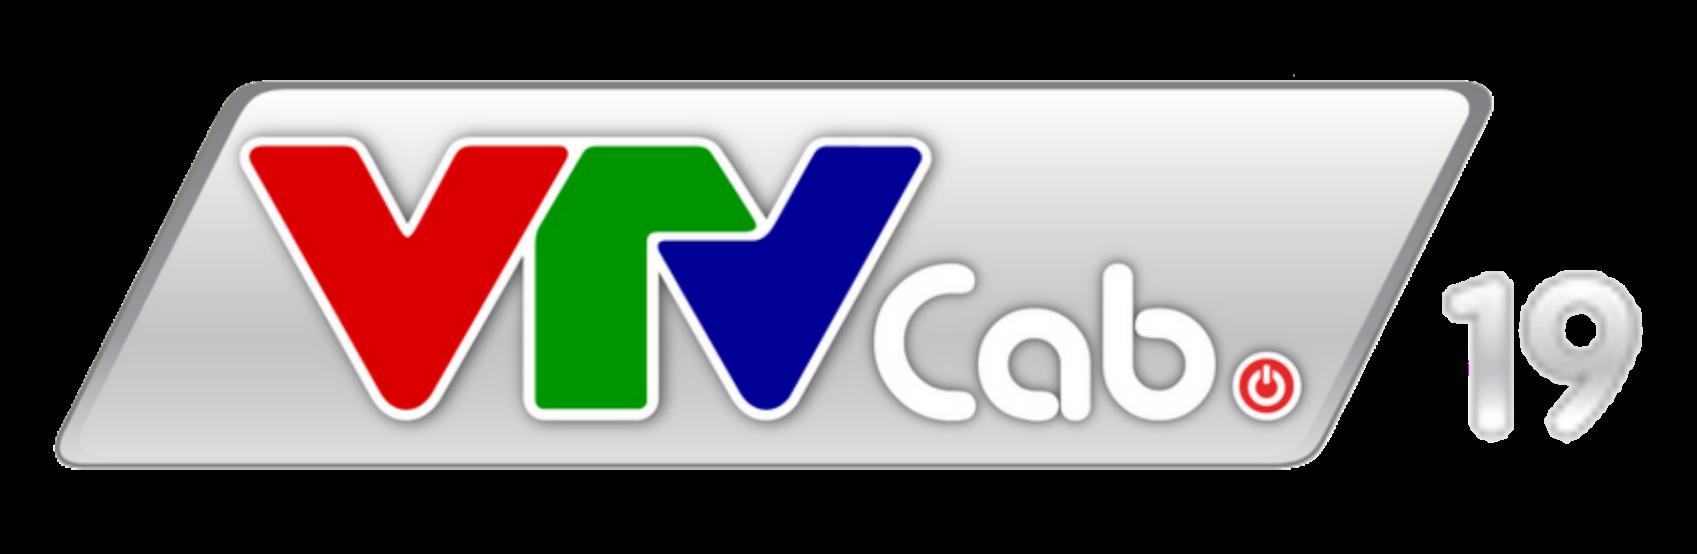 VTVCab19 - Film TV